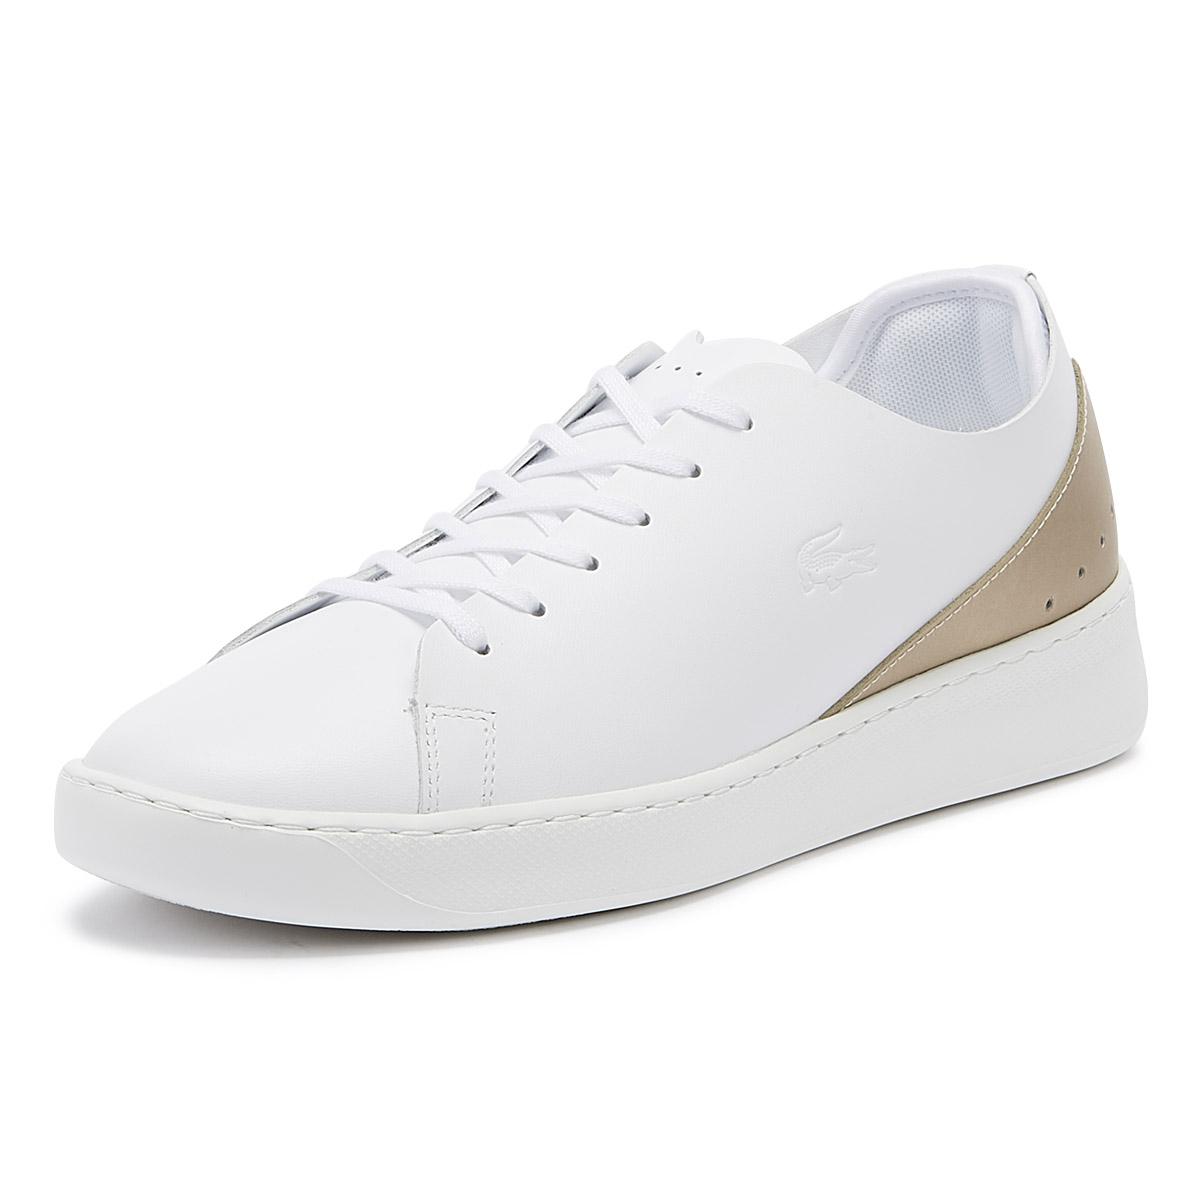 Lacoste Eyyla 219 1 Womens White / Gold